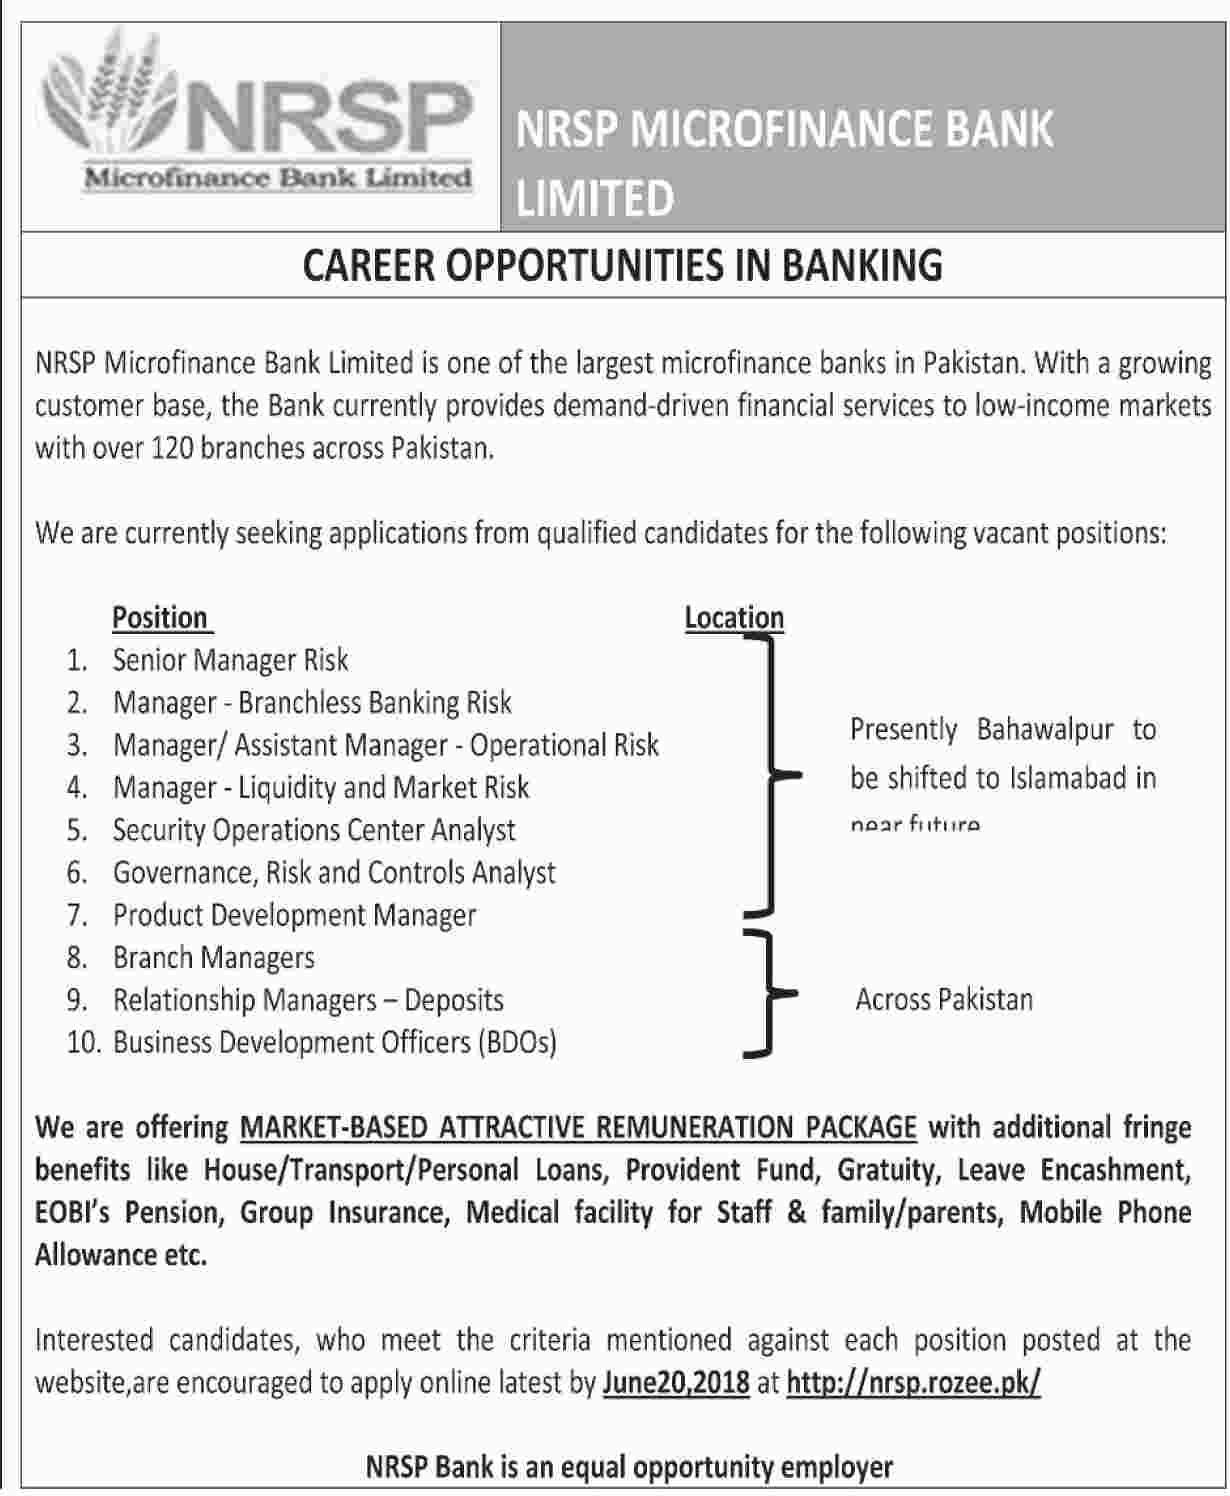 Jobs in NRSP Microfinance Bank Ltd | Apply Online